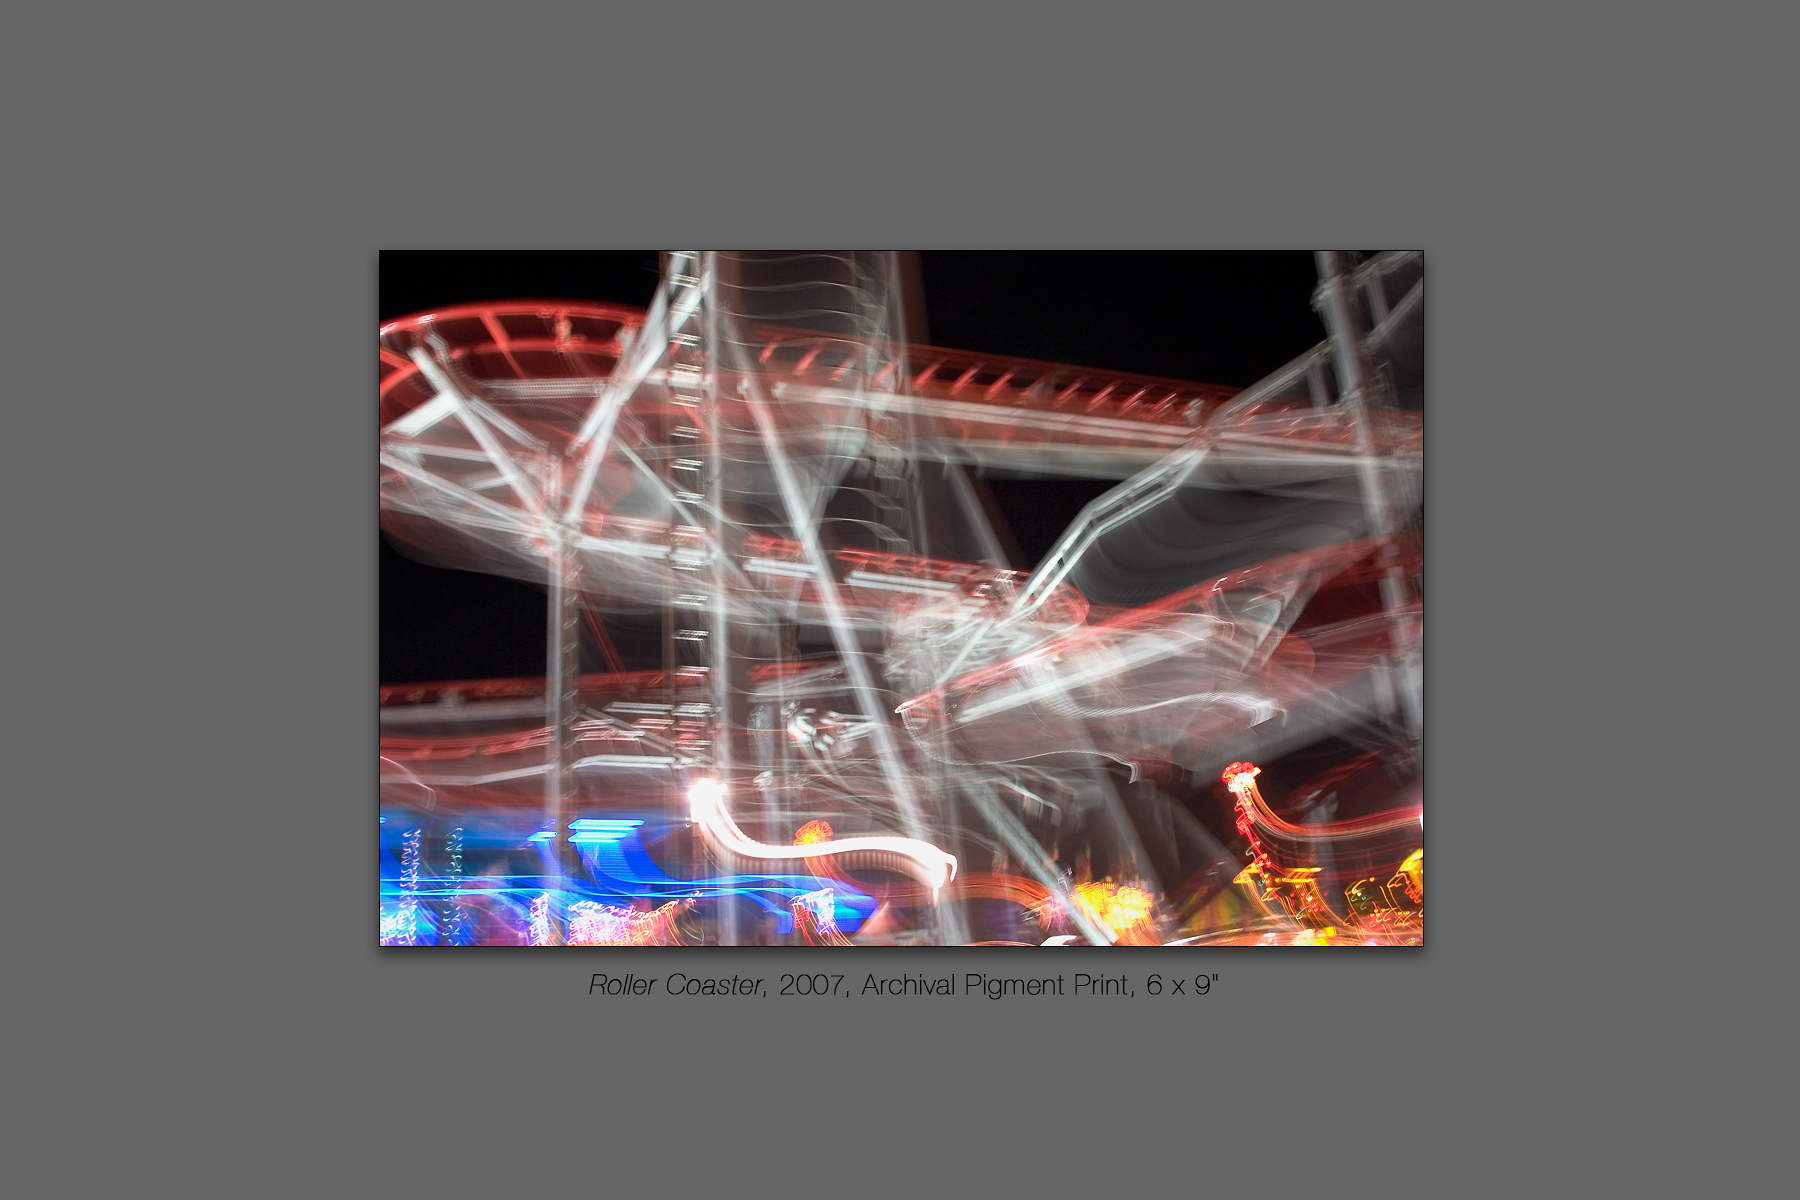 Roller Coaster, 2007